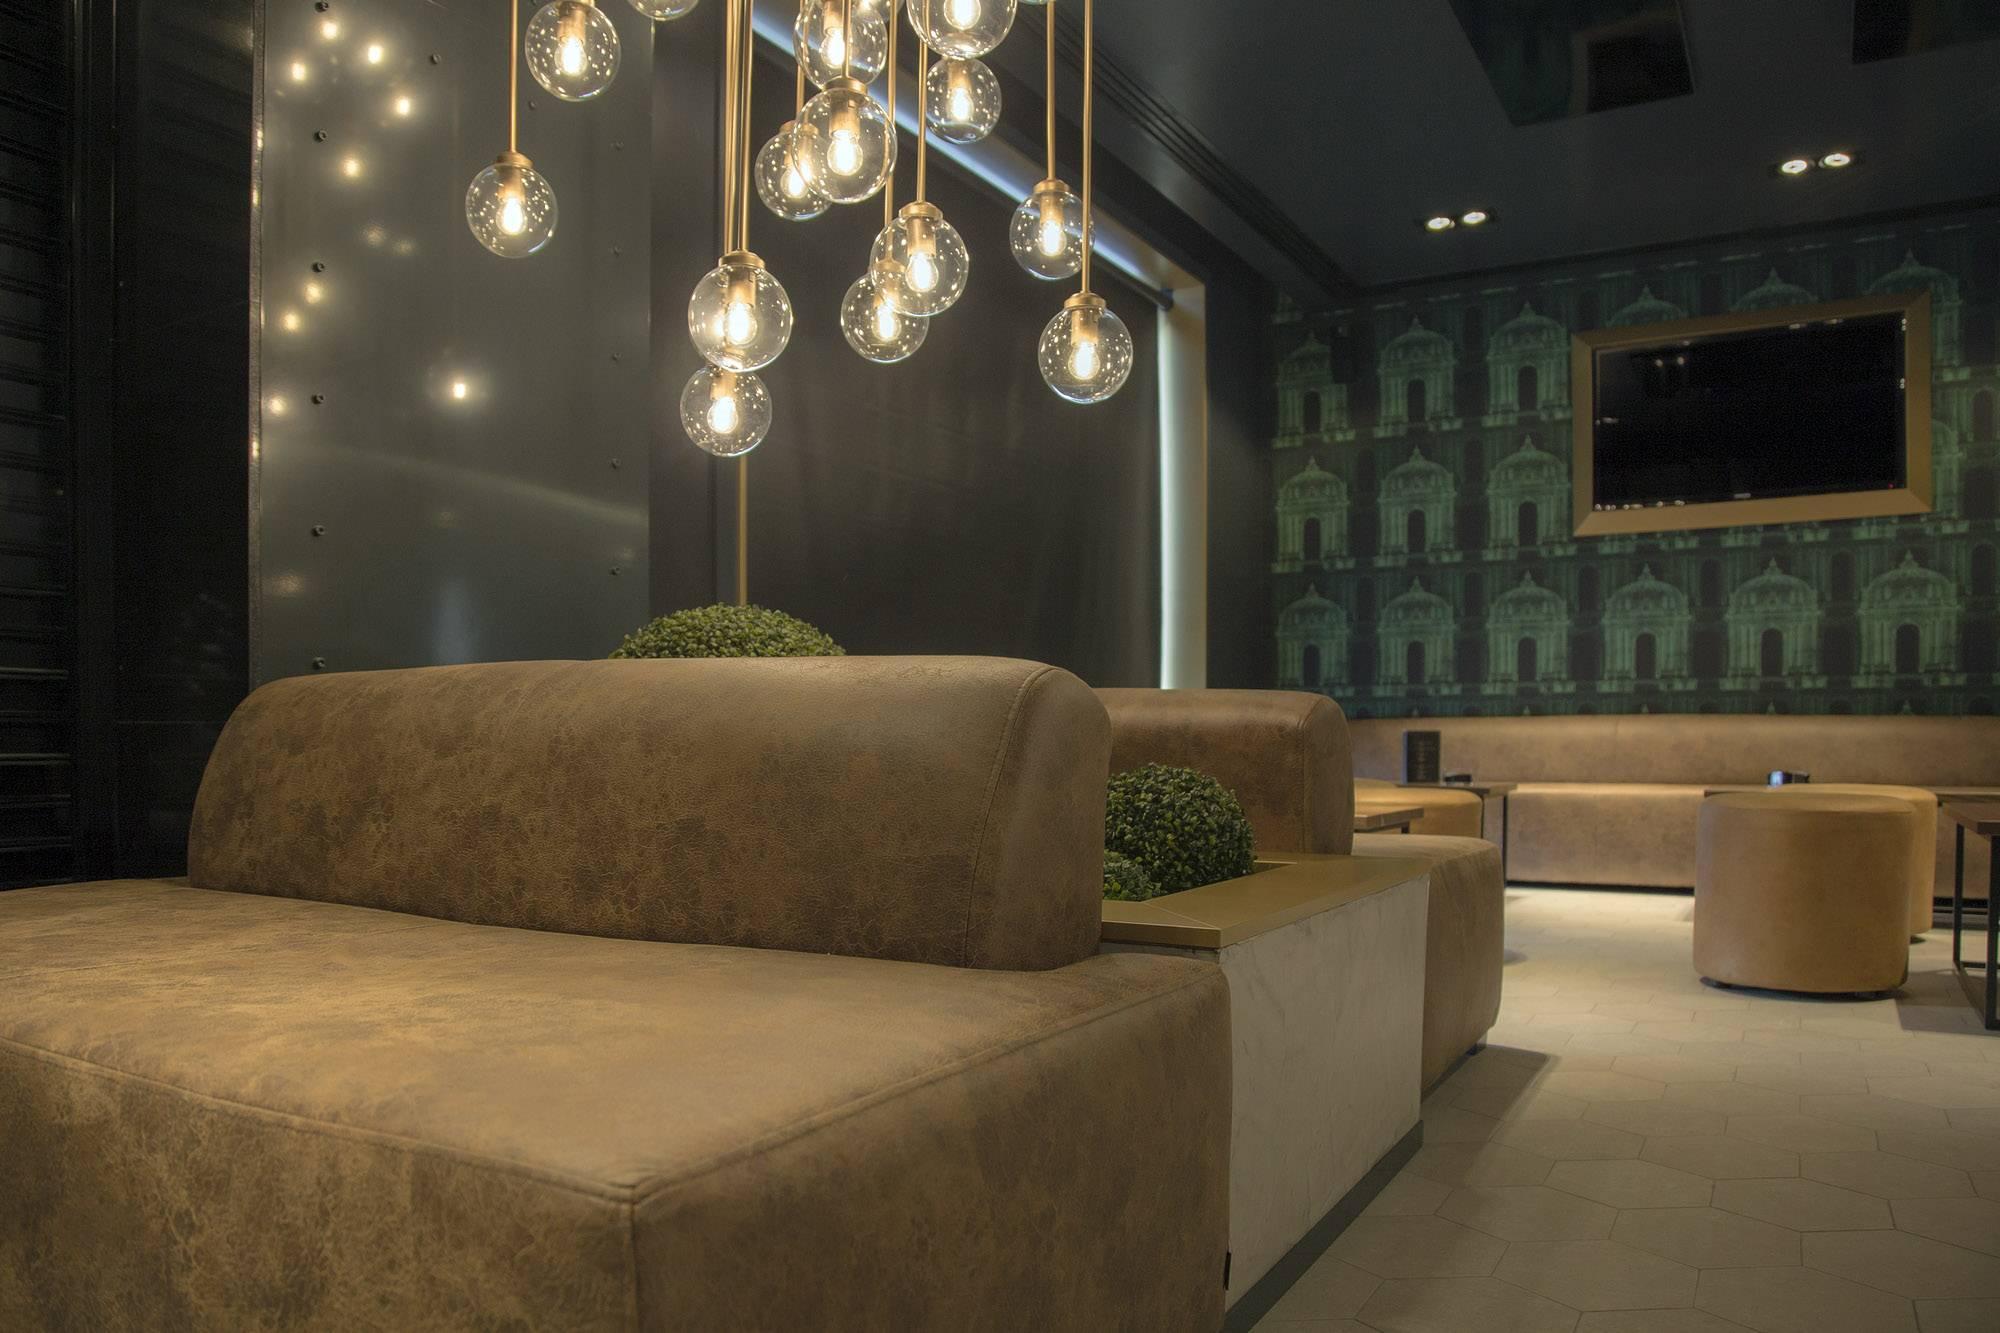 interiorismo mobiliario decoracion dluxe rosa lopez3